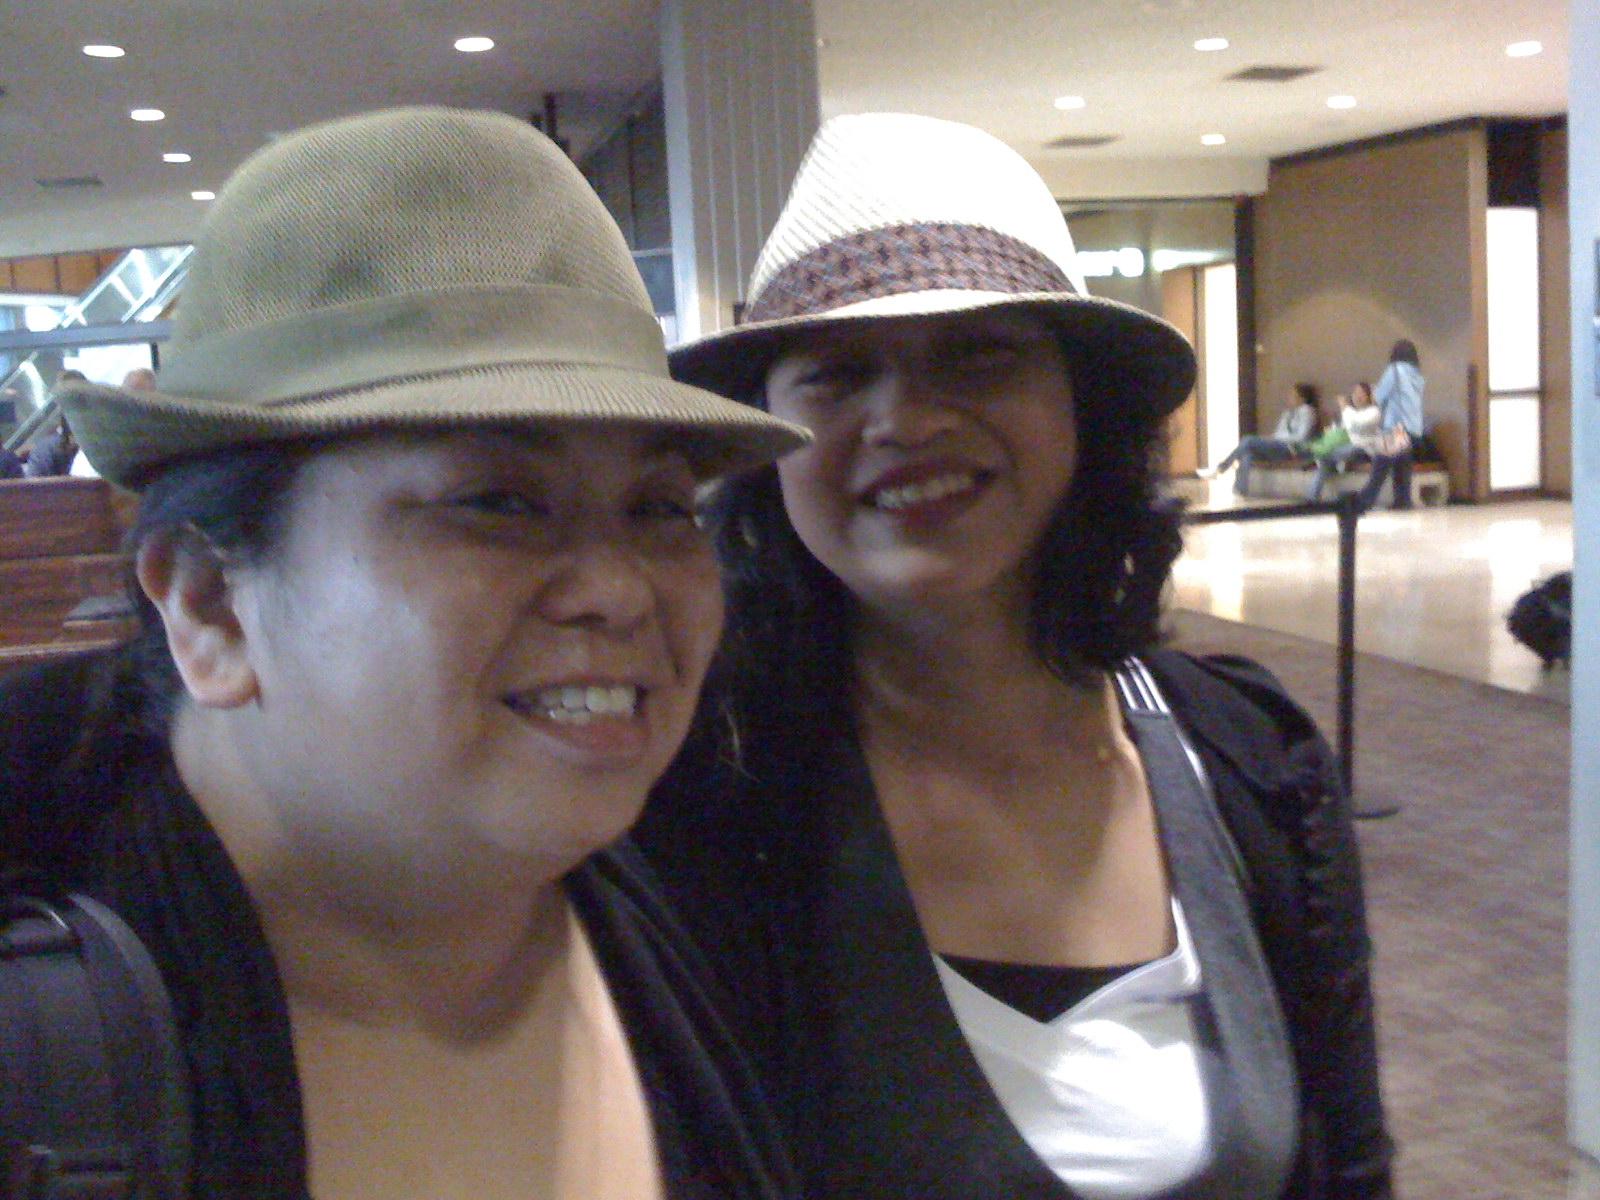 Dawn Mabalon & Allyson Tintiangco-Cubales, porkpie-ing